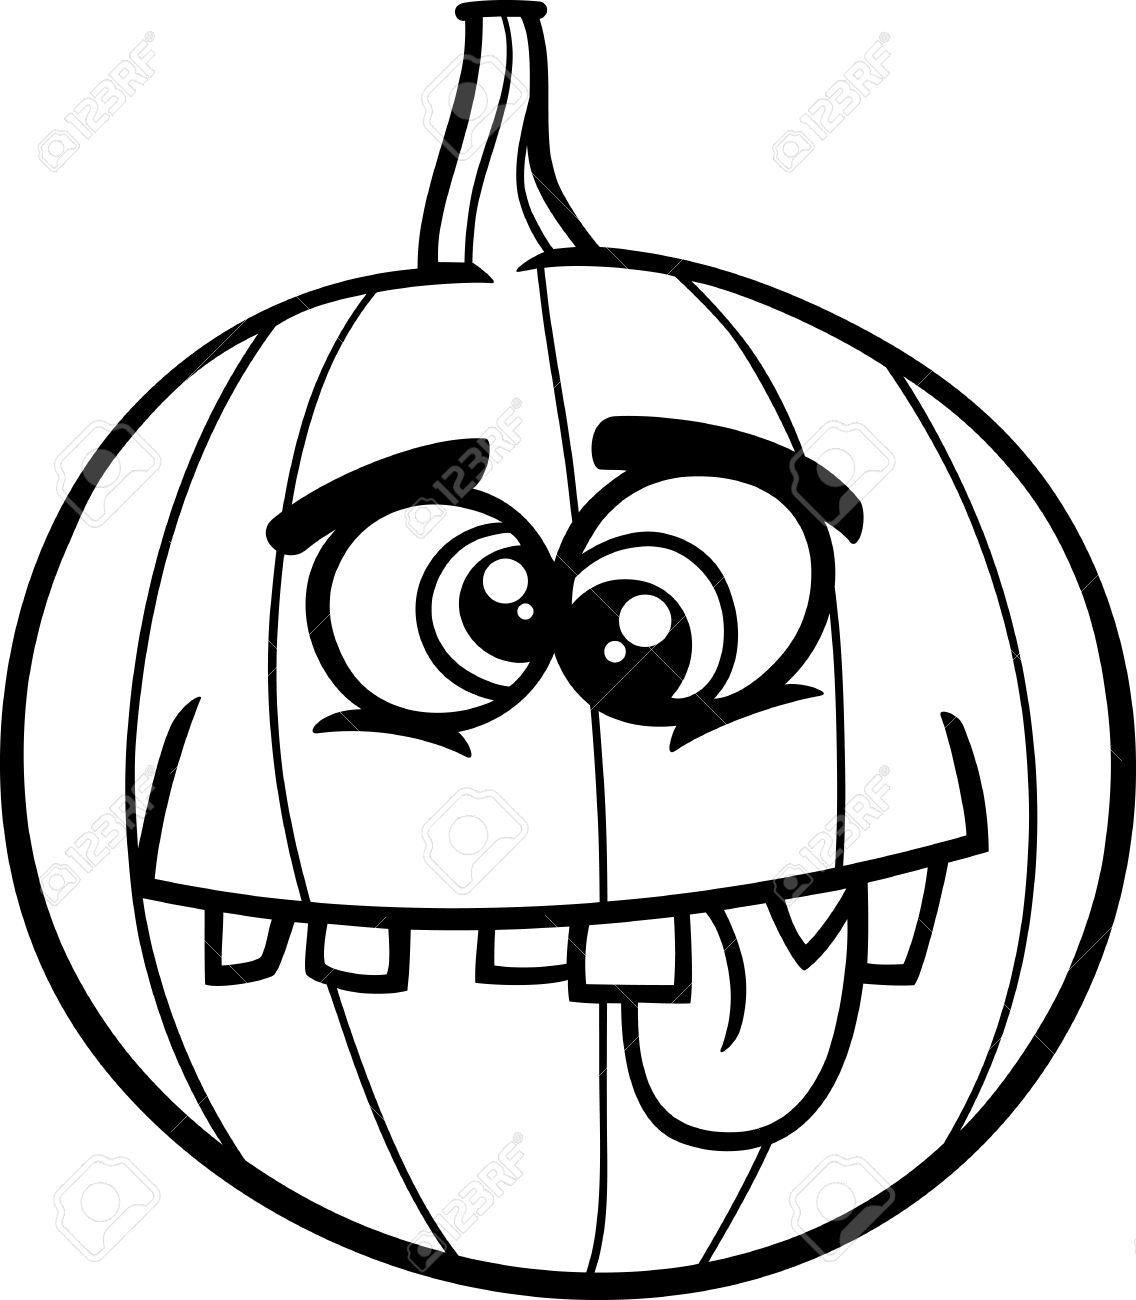 Black And White Cartoon Illustration Of Funny Jack Lantern Pumpkin ...